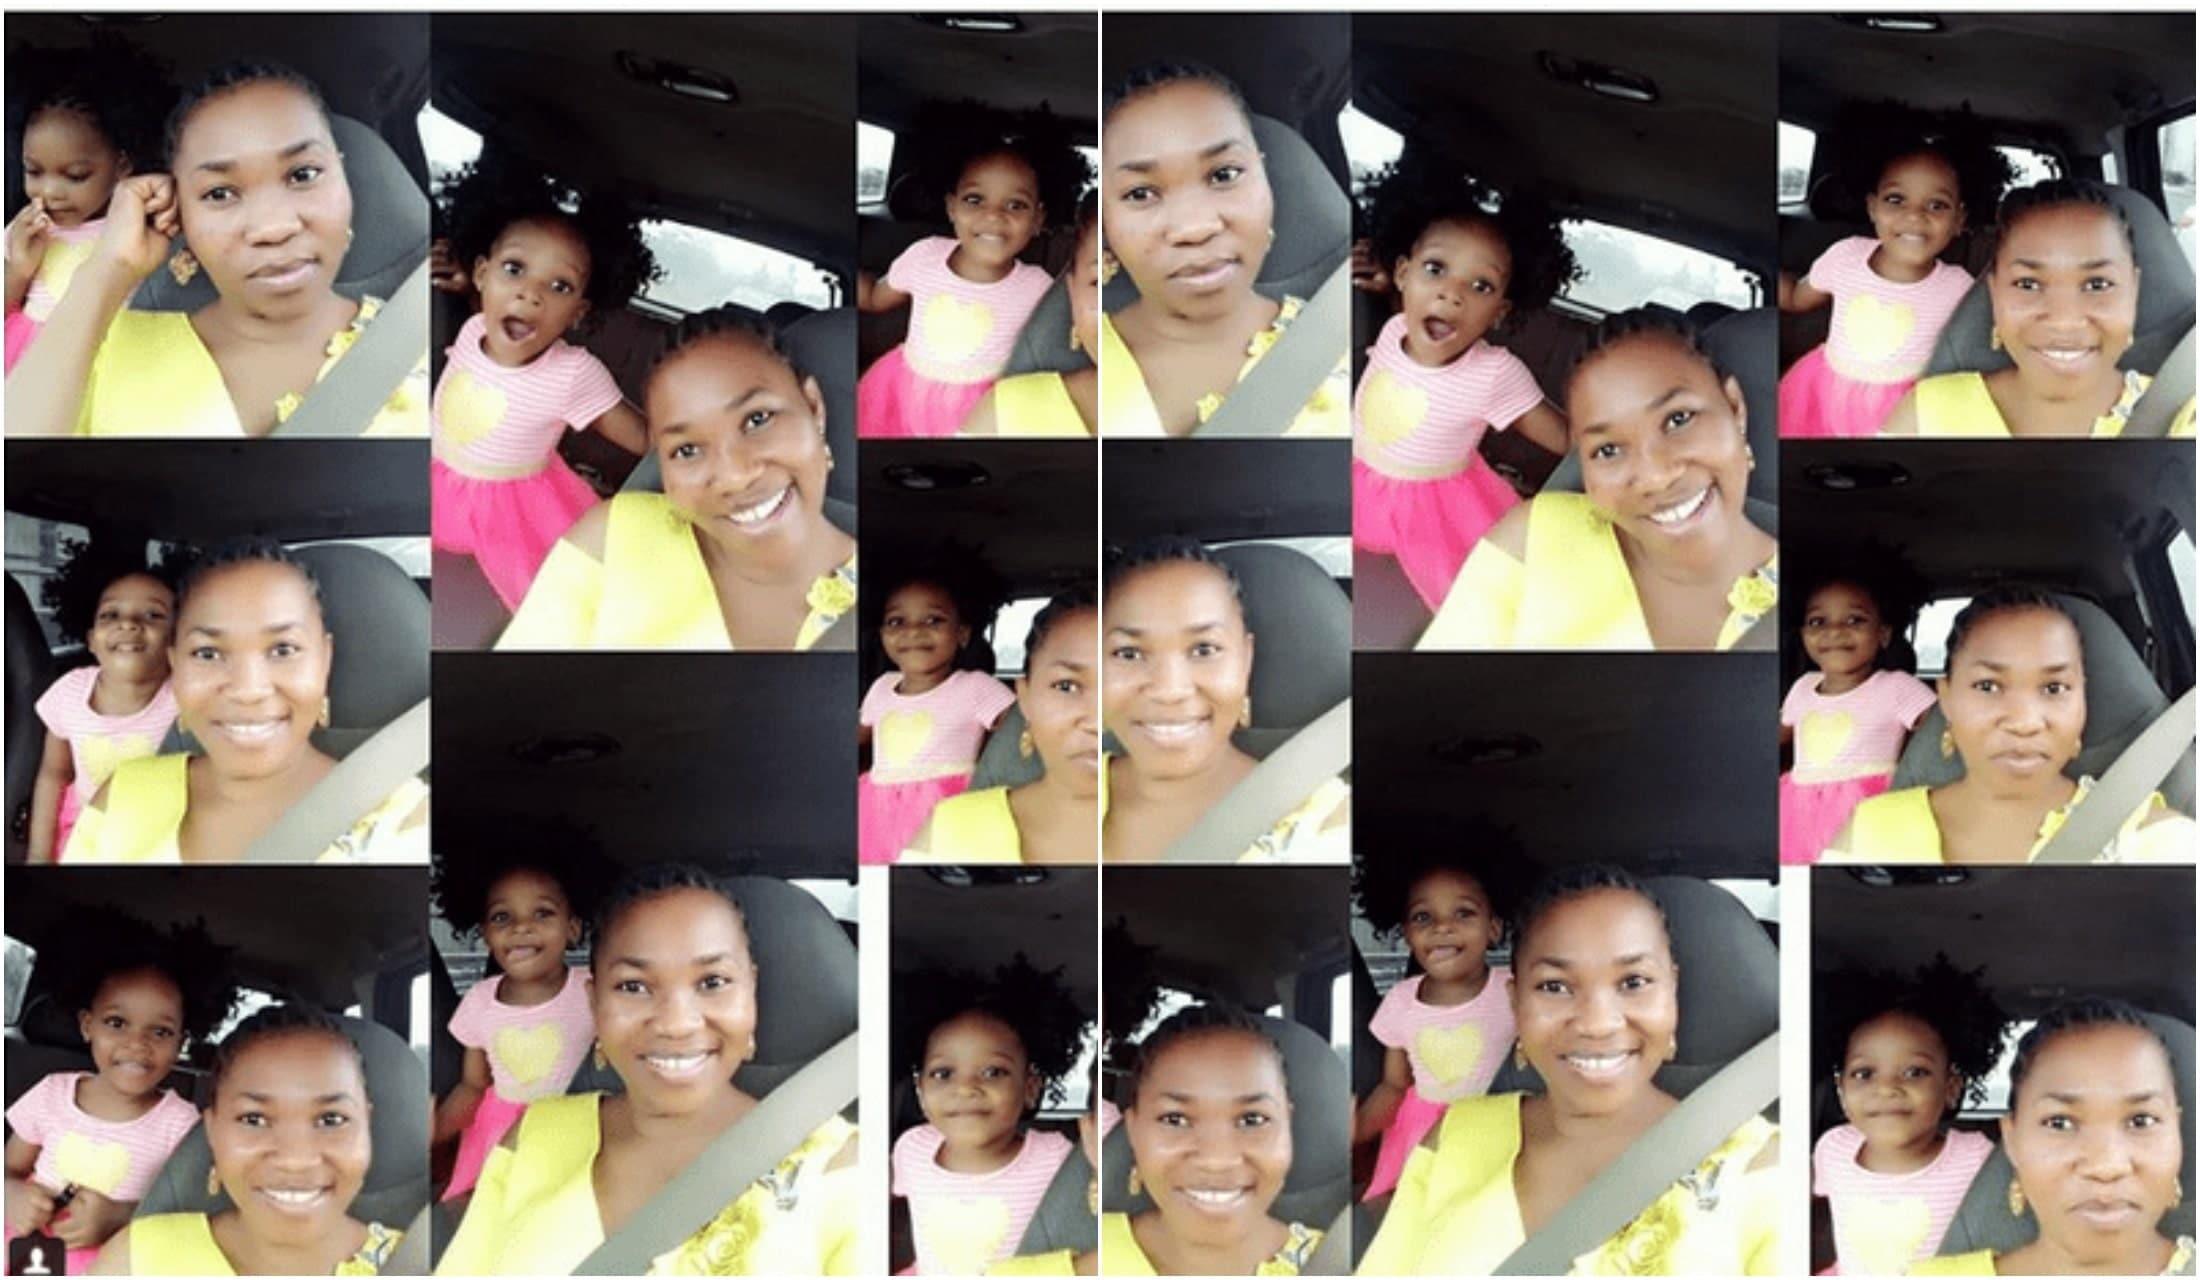 Yewande Adekoya shares new photos of her daughter